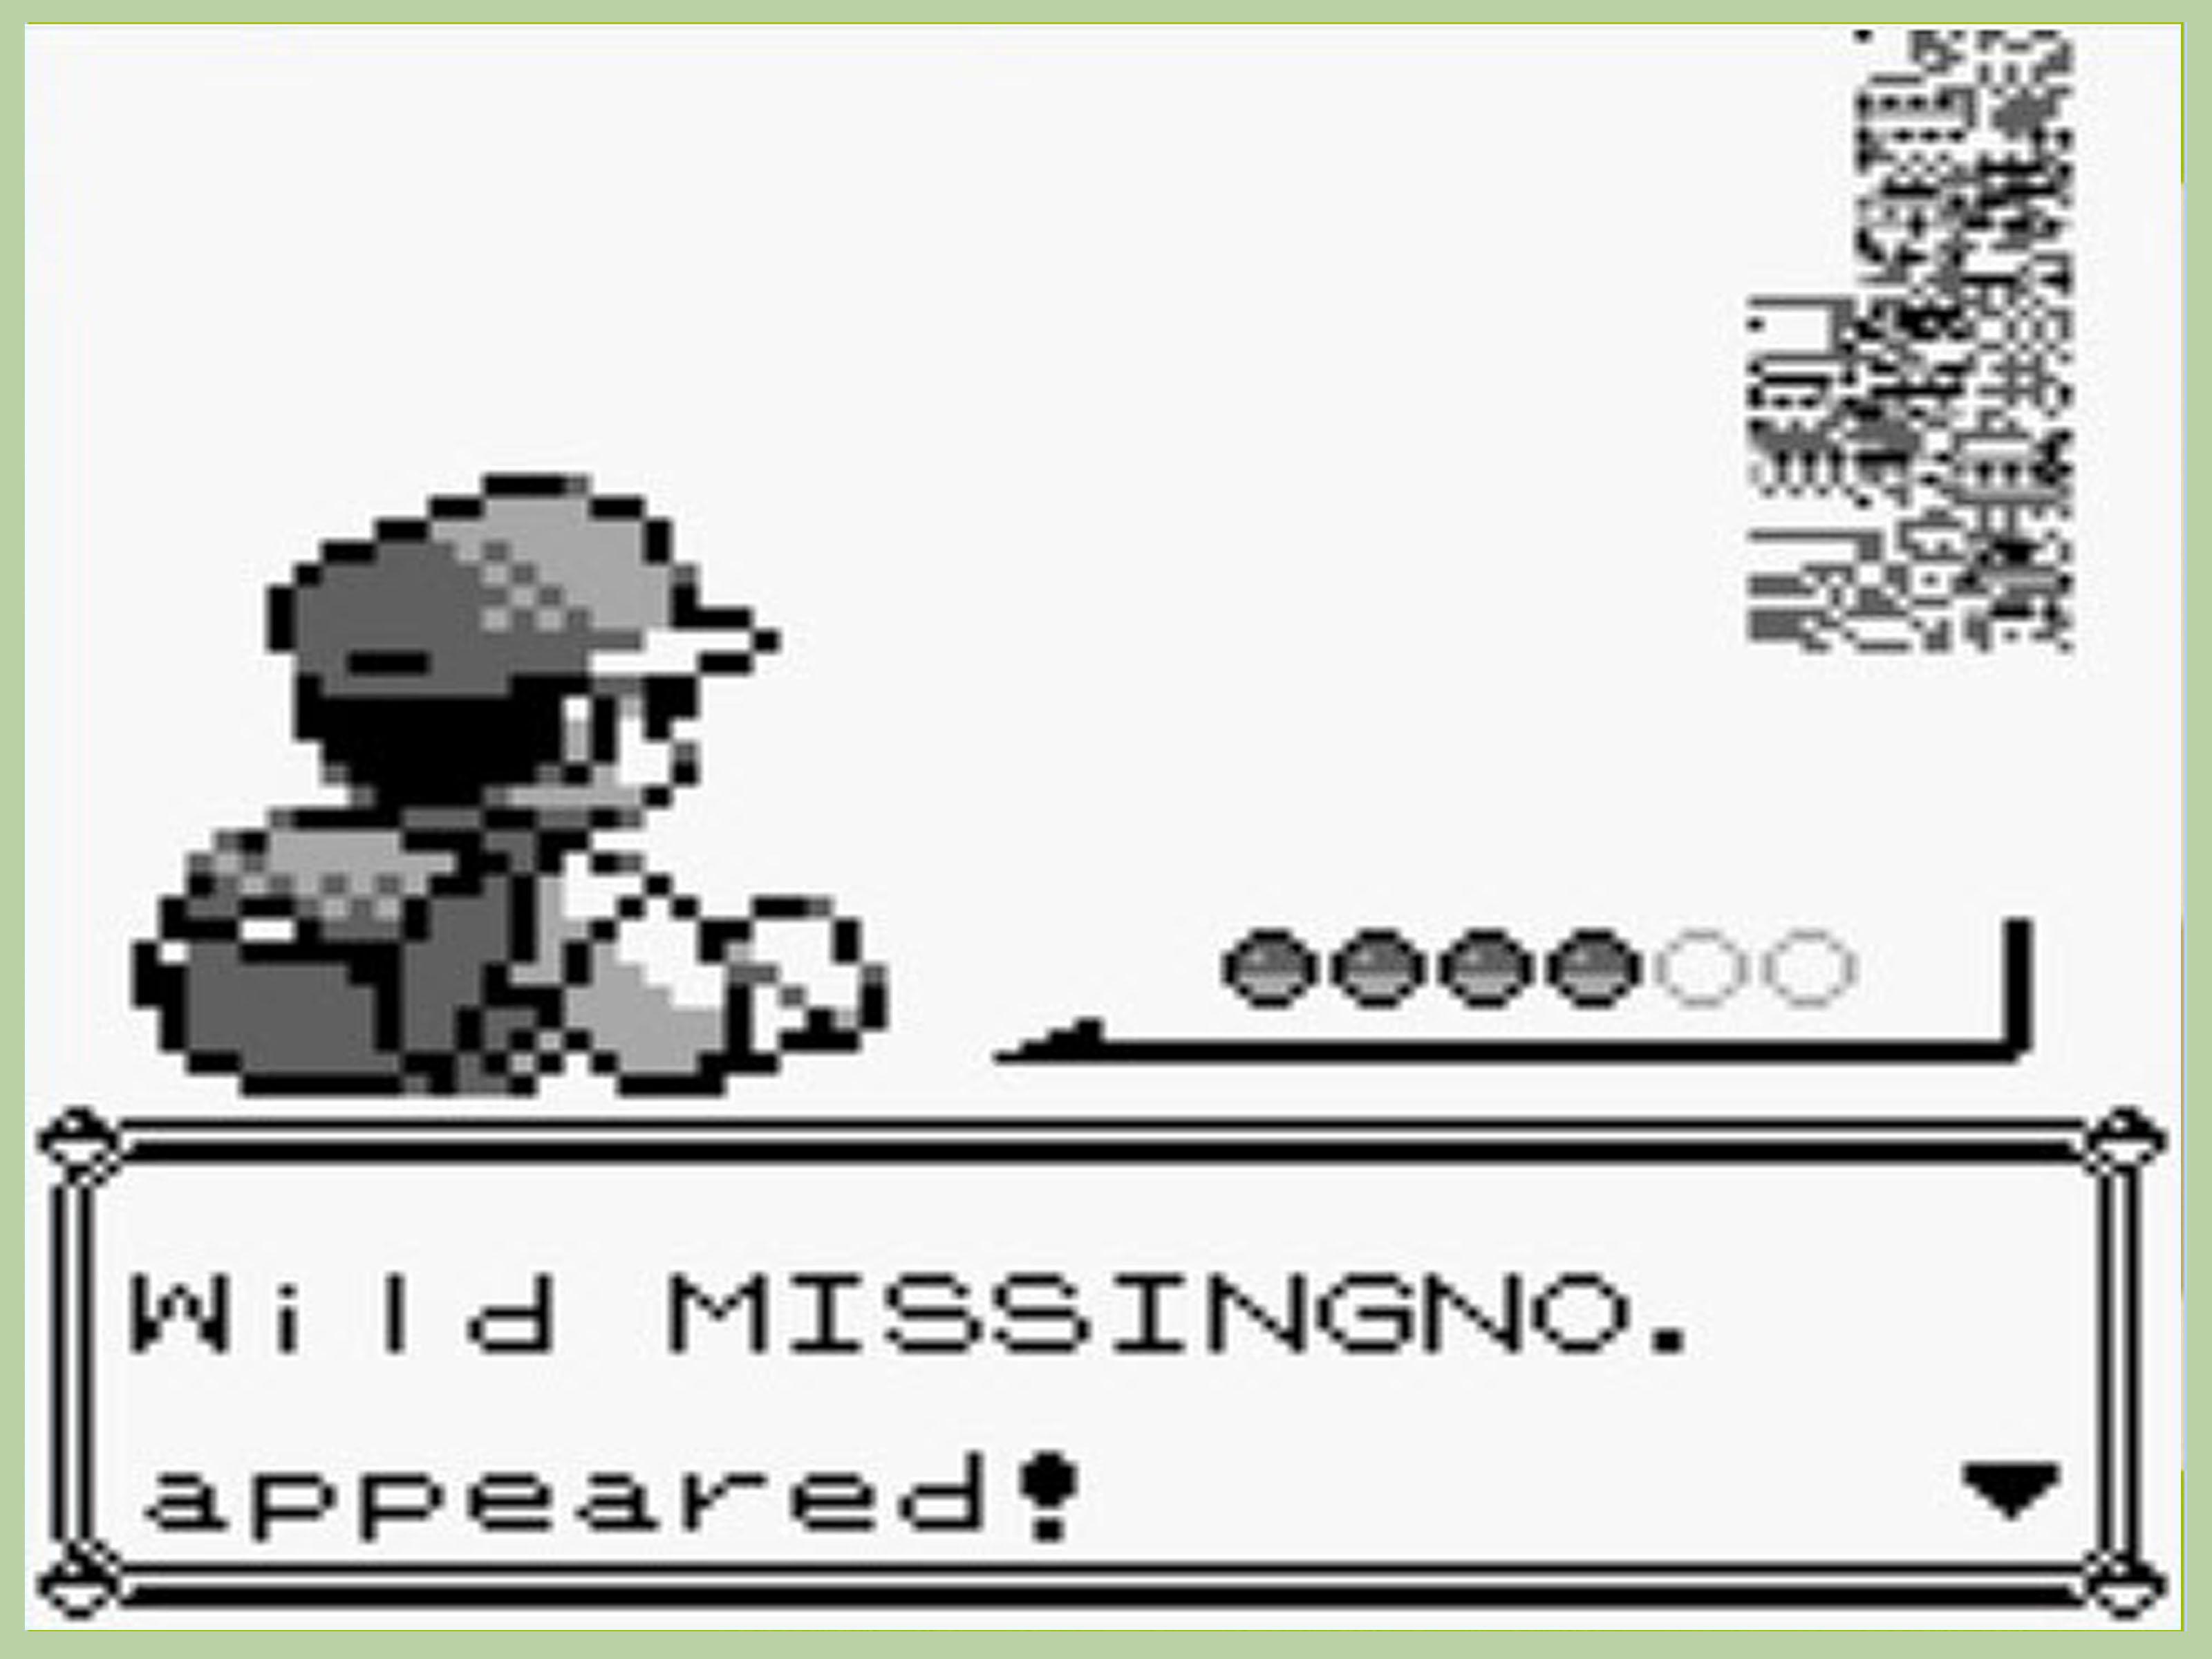 Pokémon e mistero missingno